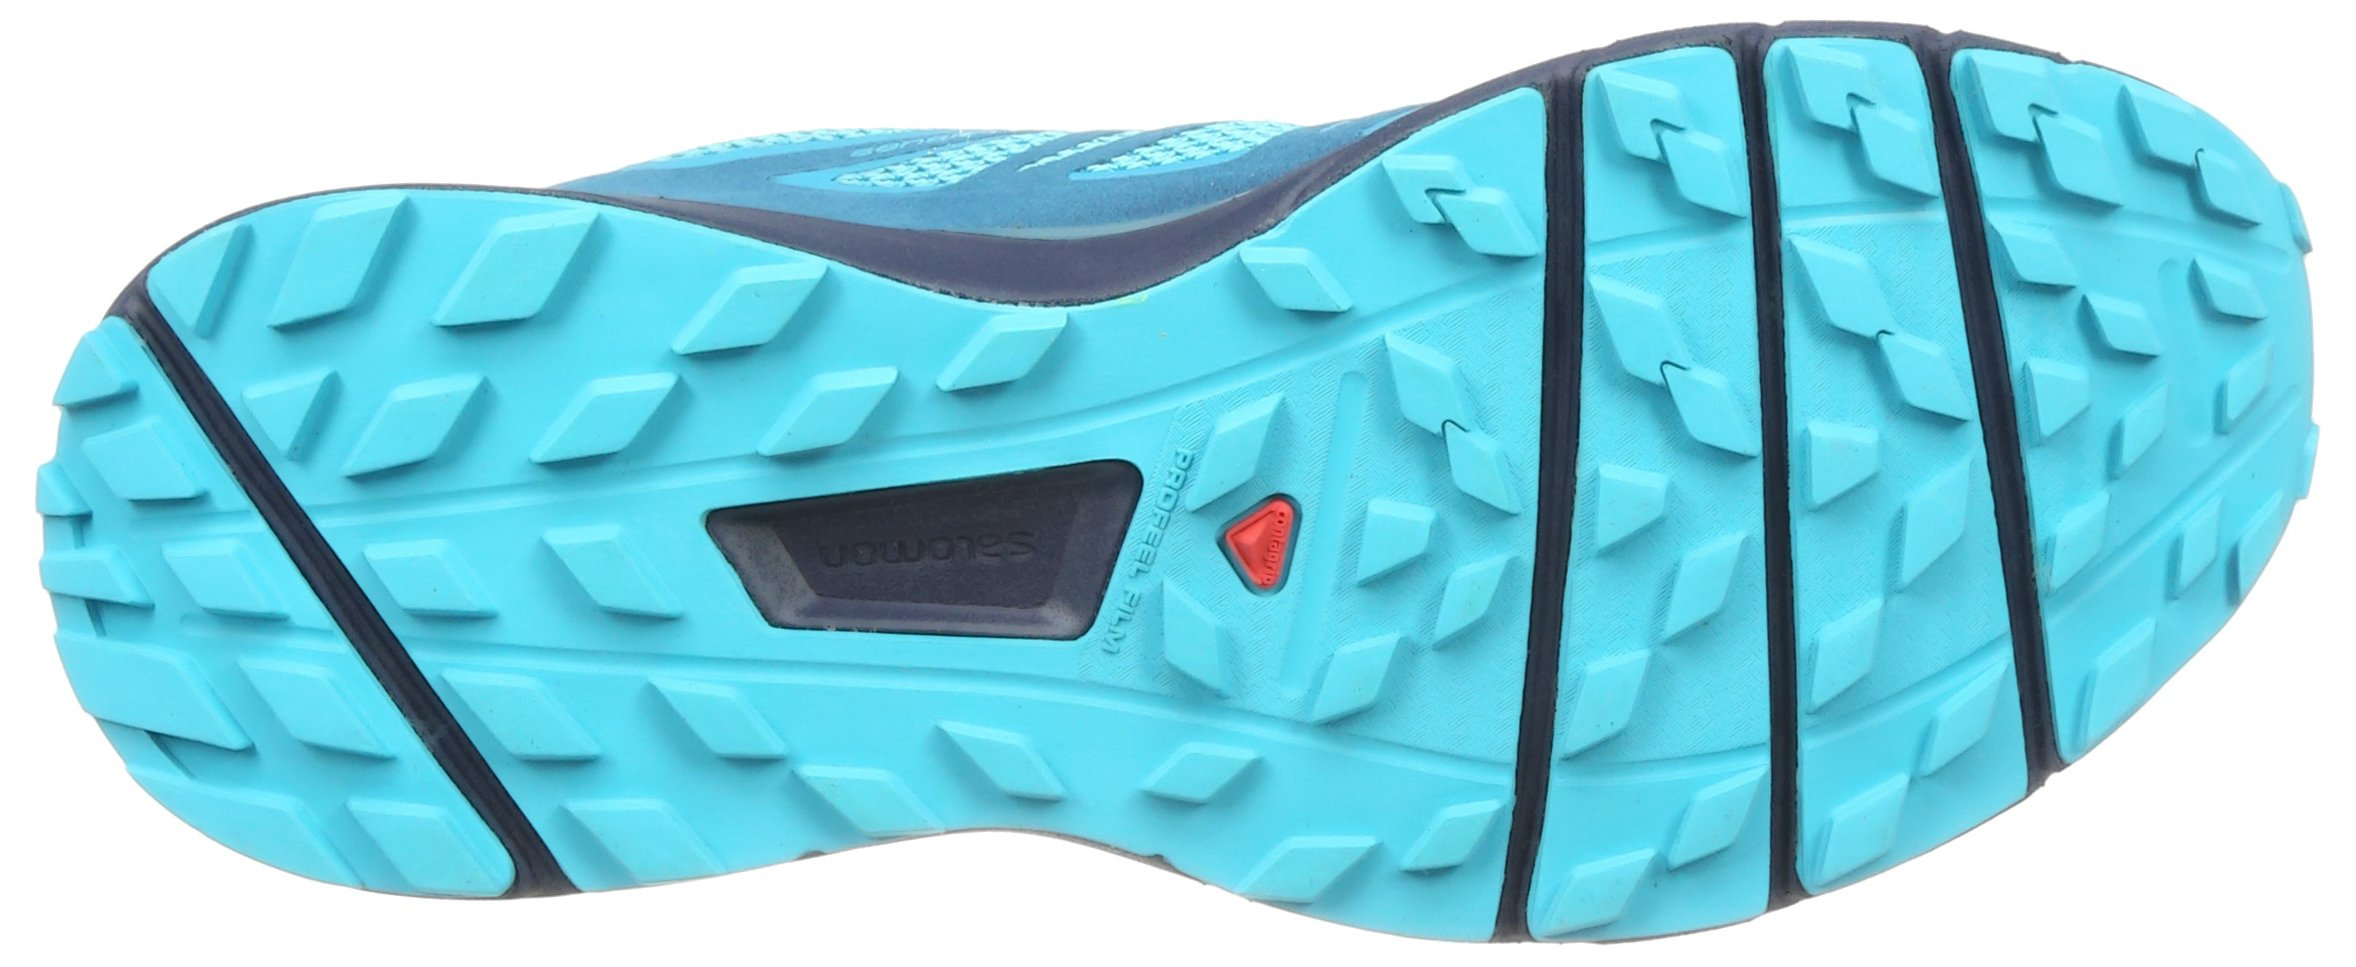 Salomon Sense Ride Running Shoe - Women's Blue Bird/Deep Lagoon/Navy Blazer 7 by Salomon (Image #3)